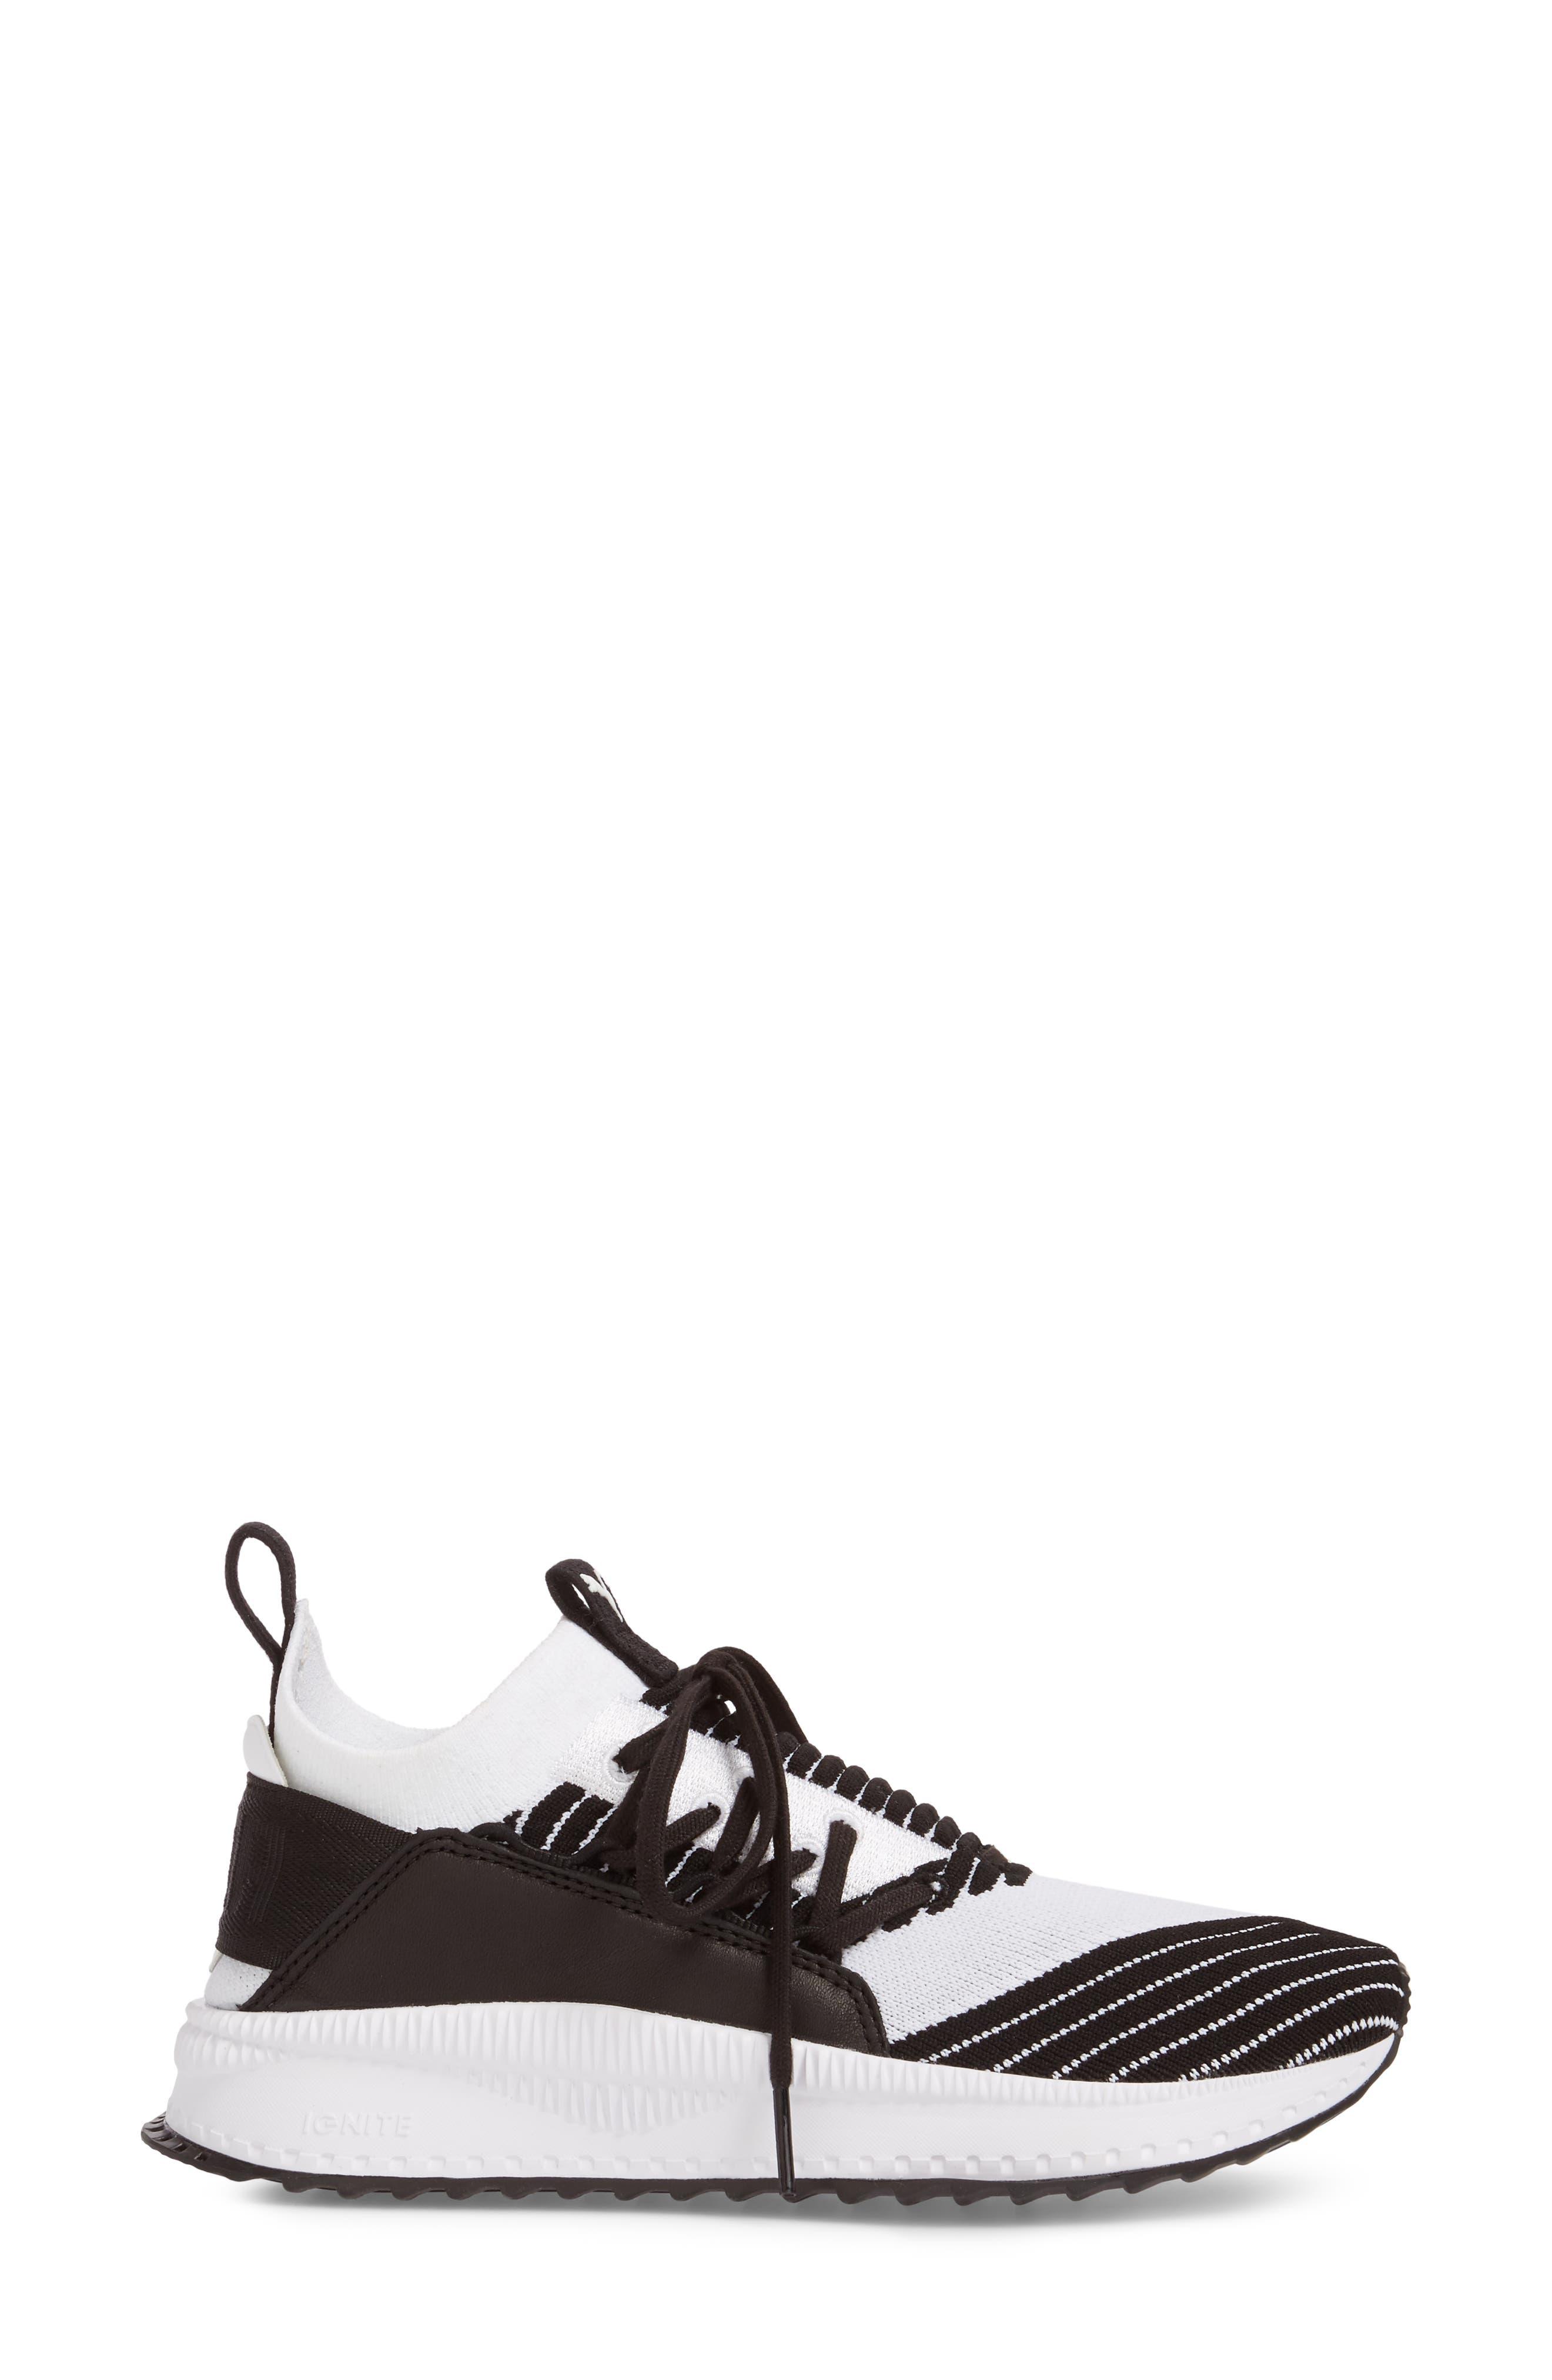 Tsugi Jun Knit Sneaker,                             Alternate thumbnail 16, color,